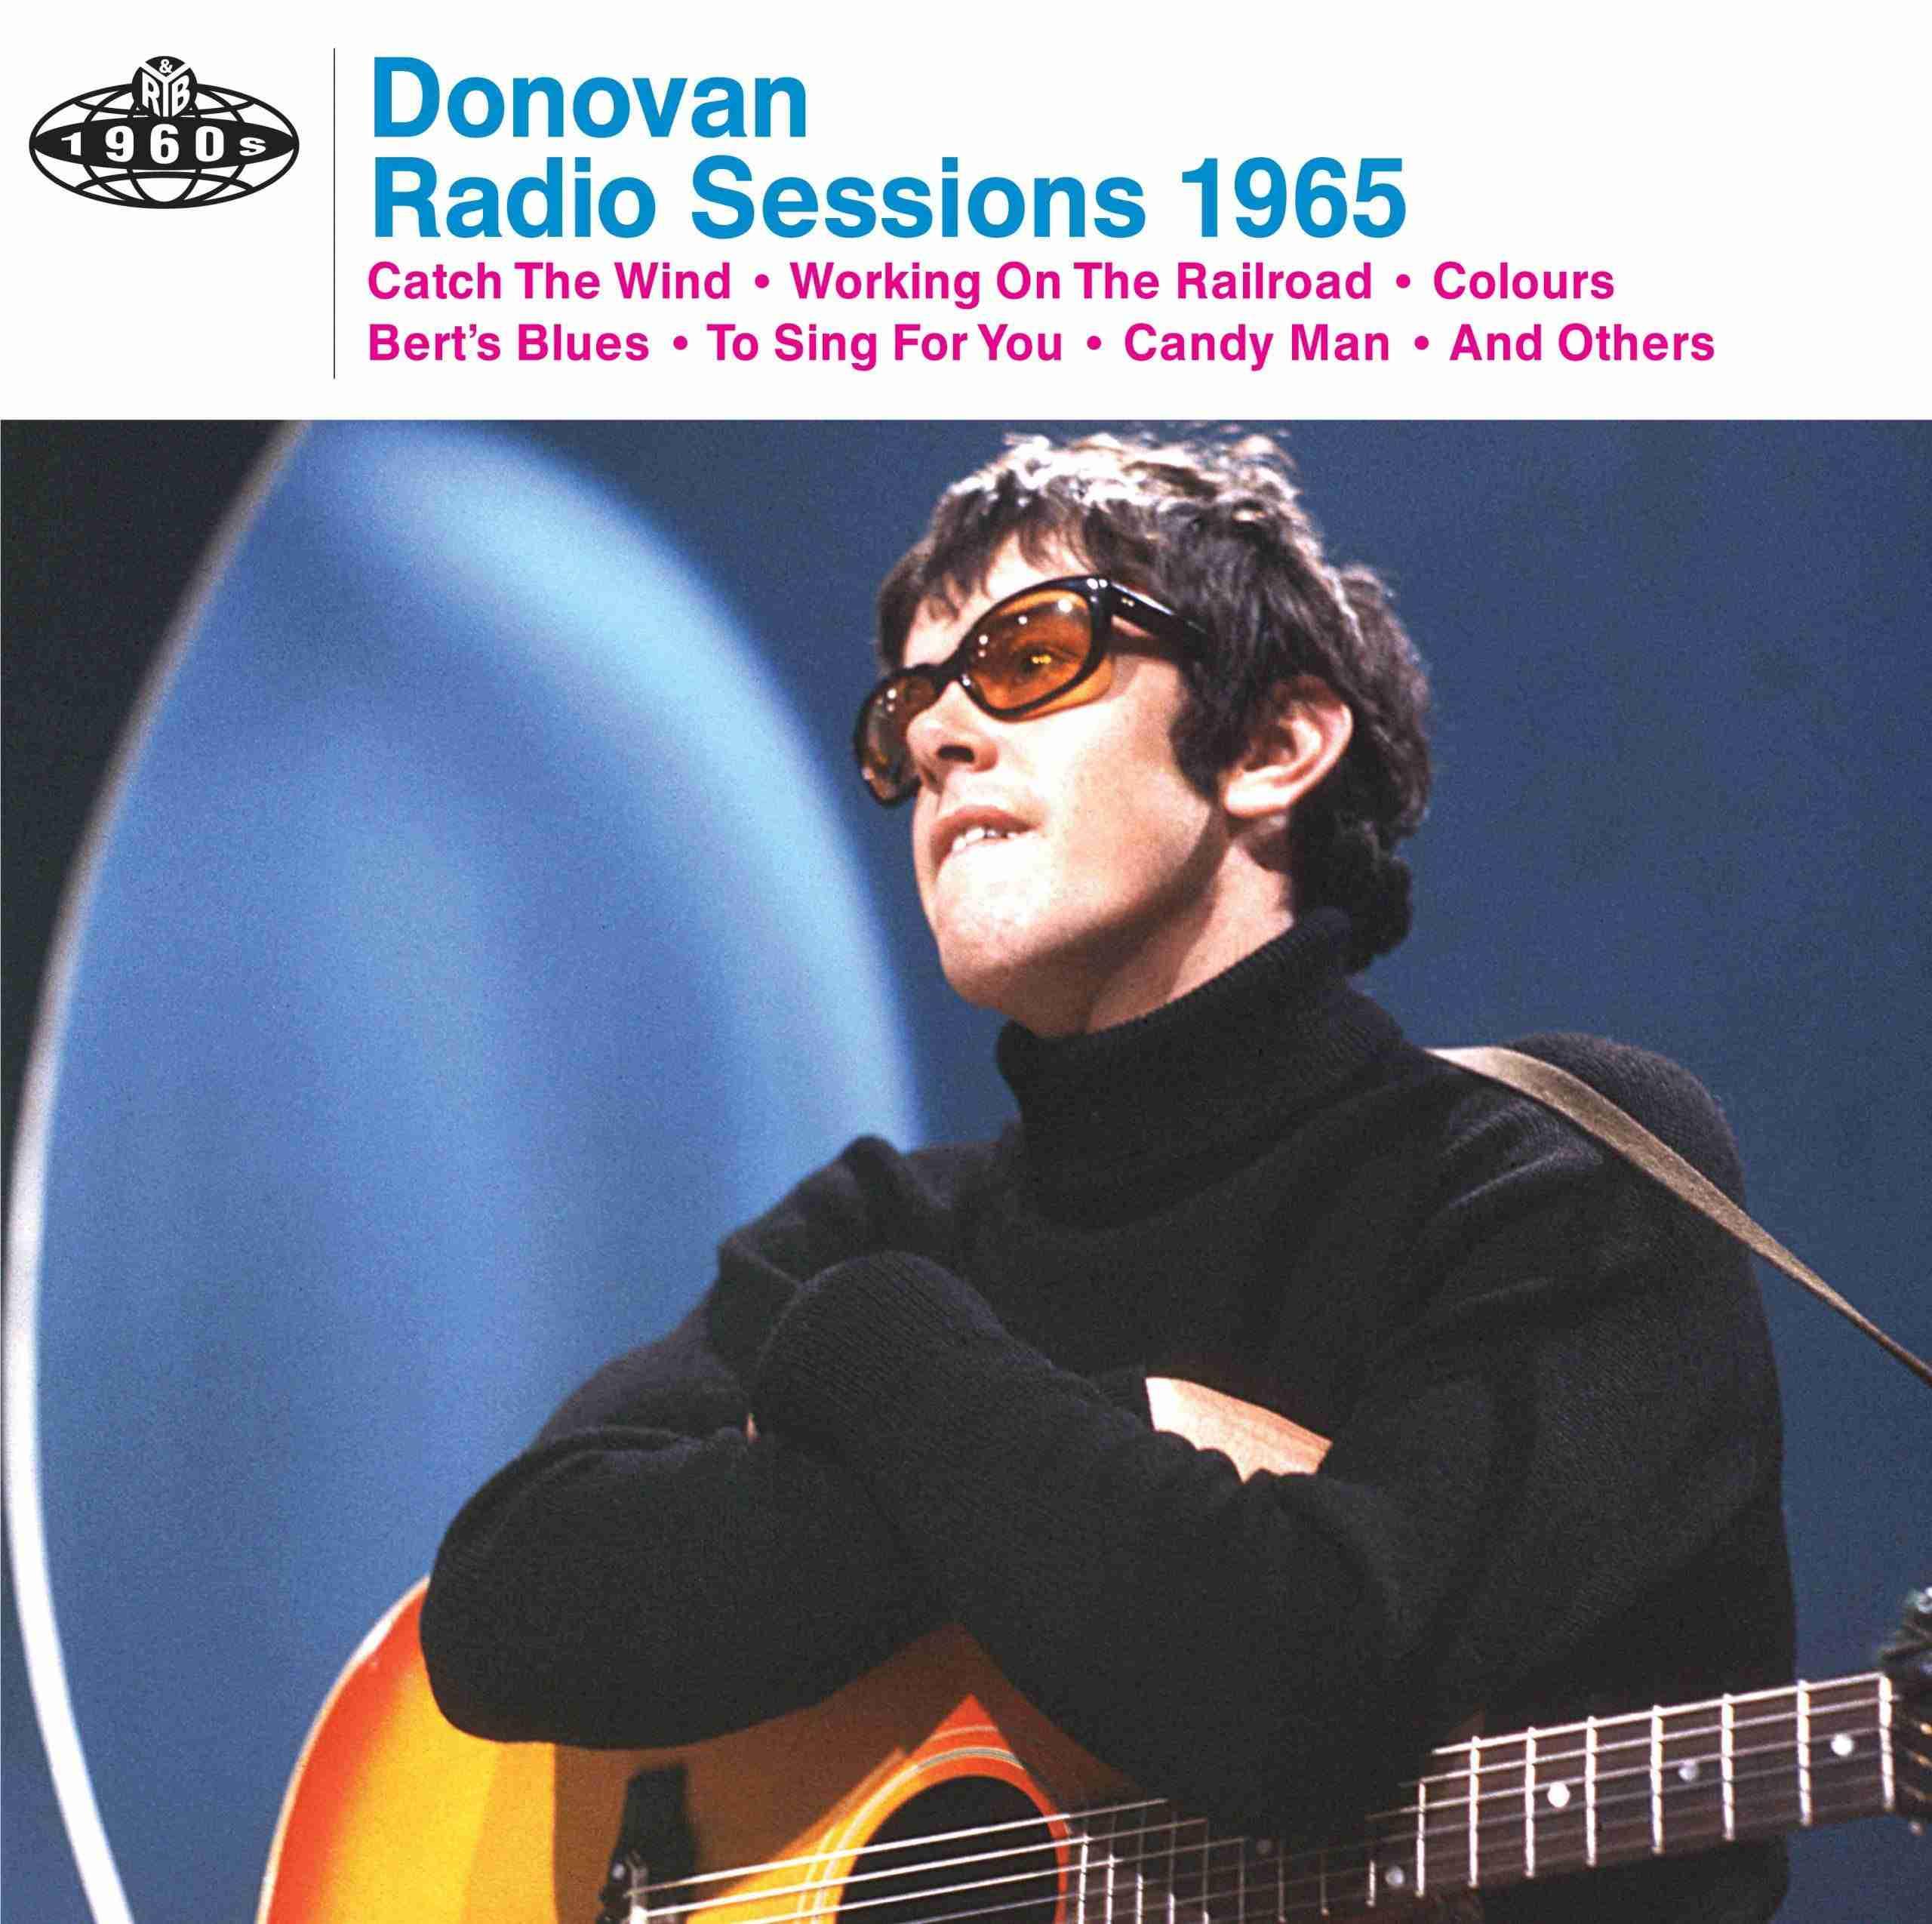 Donovan Radio Sessions 67